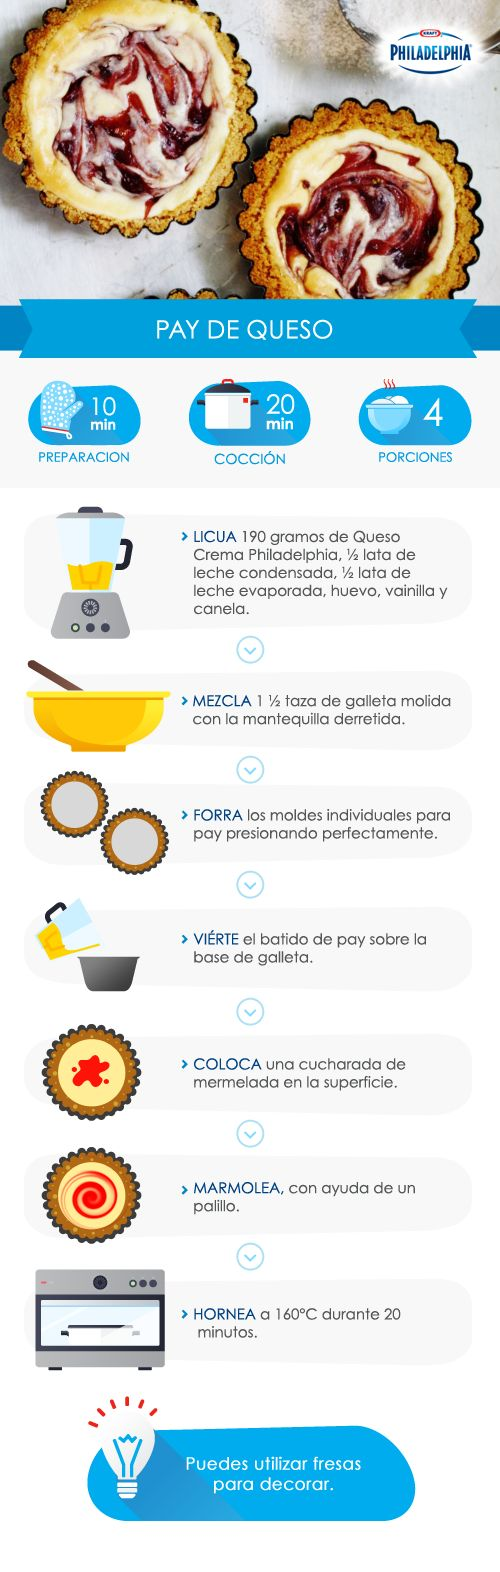 #FestivalDeLa Tarta Prepara un pay de Queso con Queso Crema Philadelphia, transfórmalo de rico a delicioso.